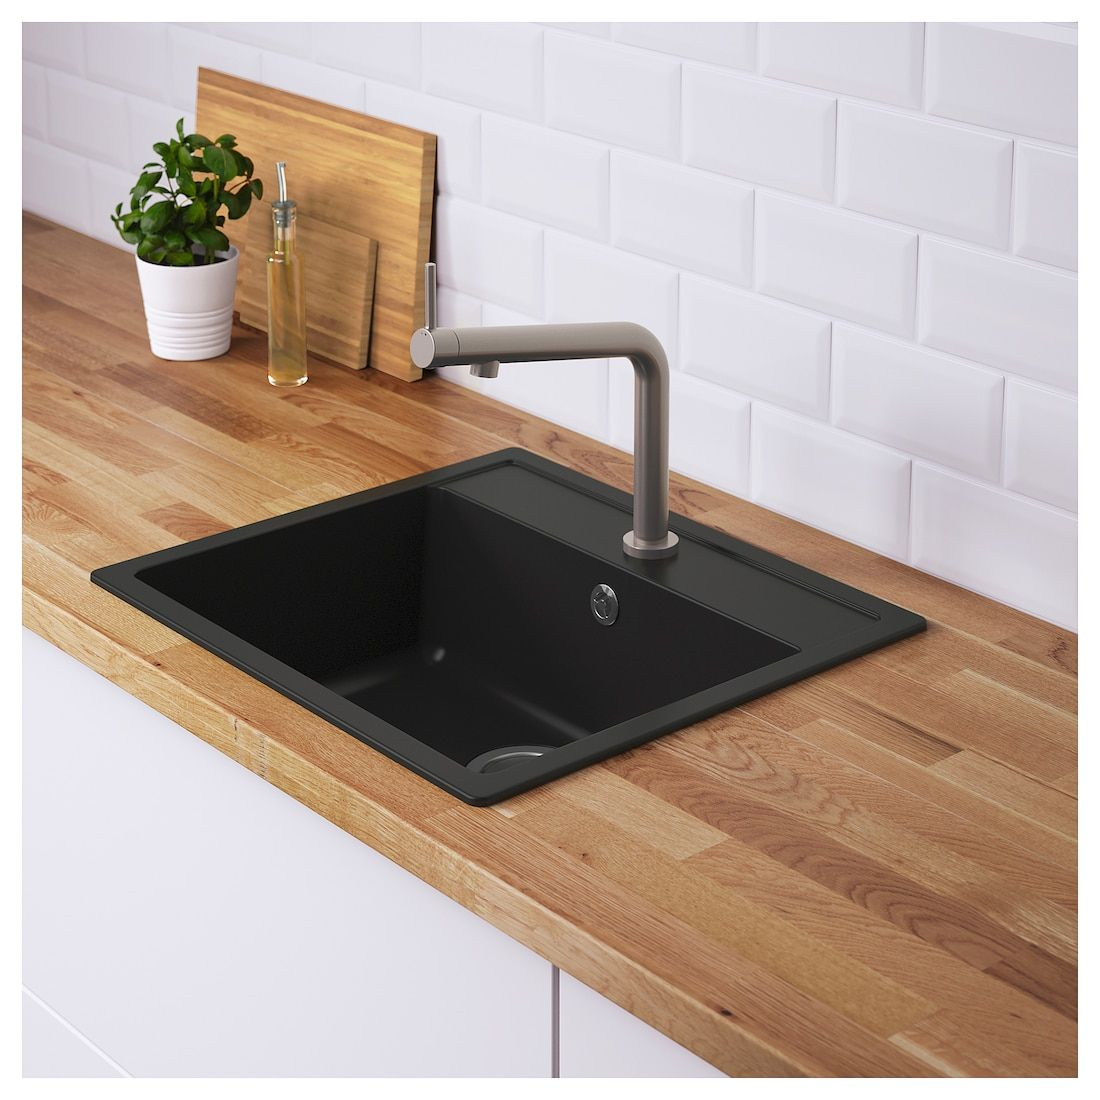 Hallviken Indbygningsvask Enkelt Sort Quartzkomposit 56x50 Cm Kokkenvandhane Handvask Kokkenvask